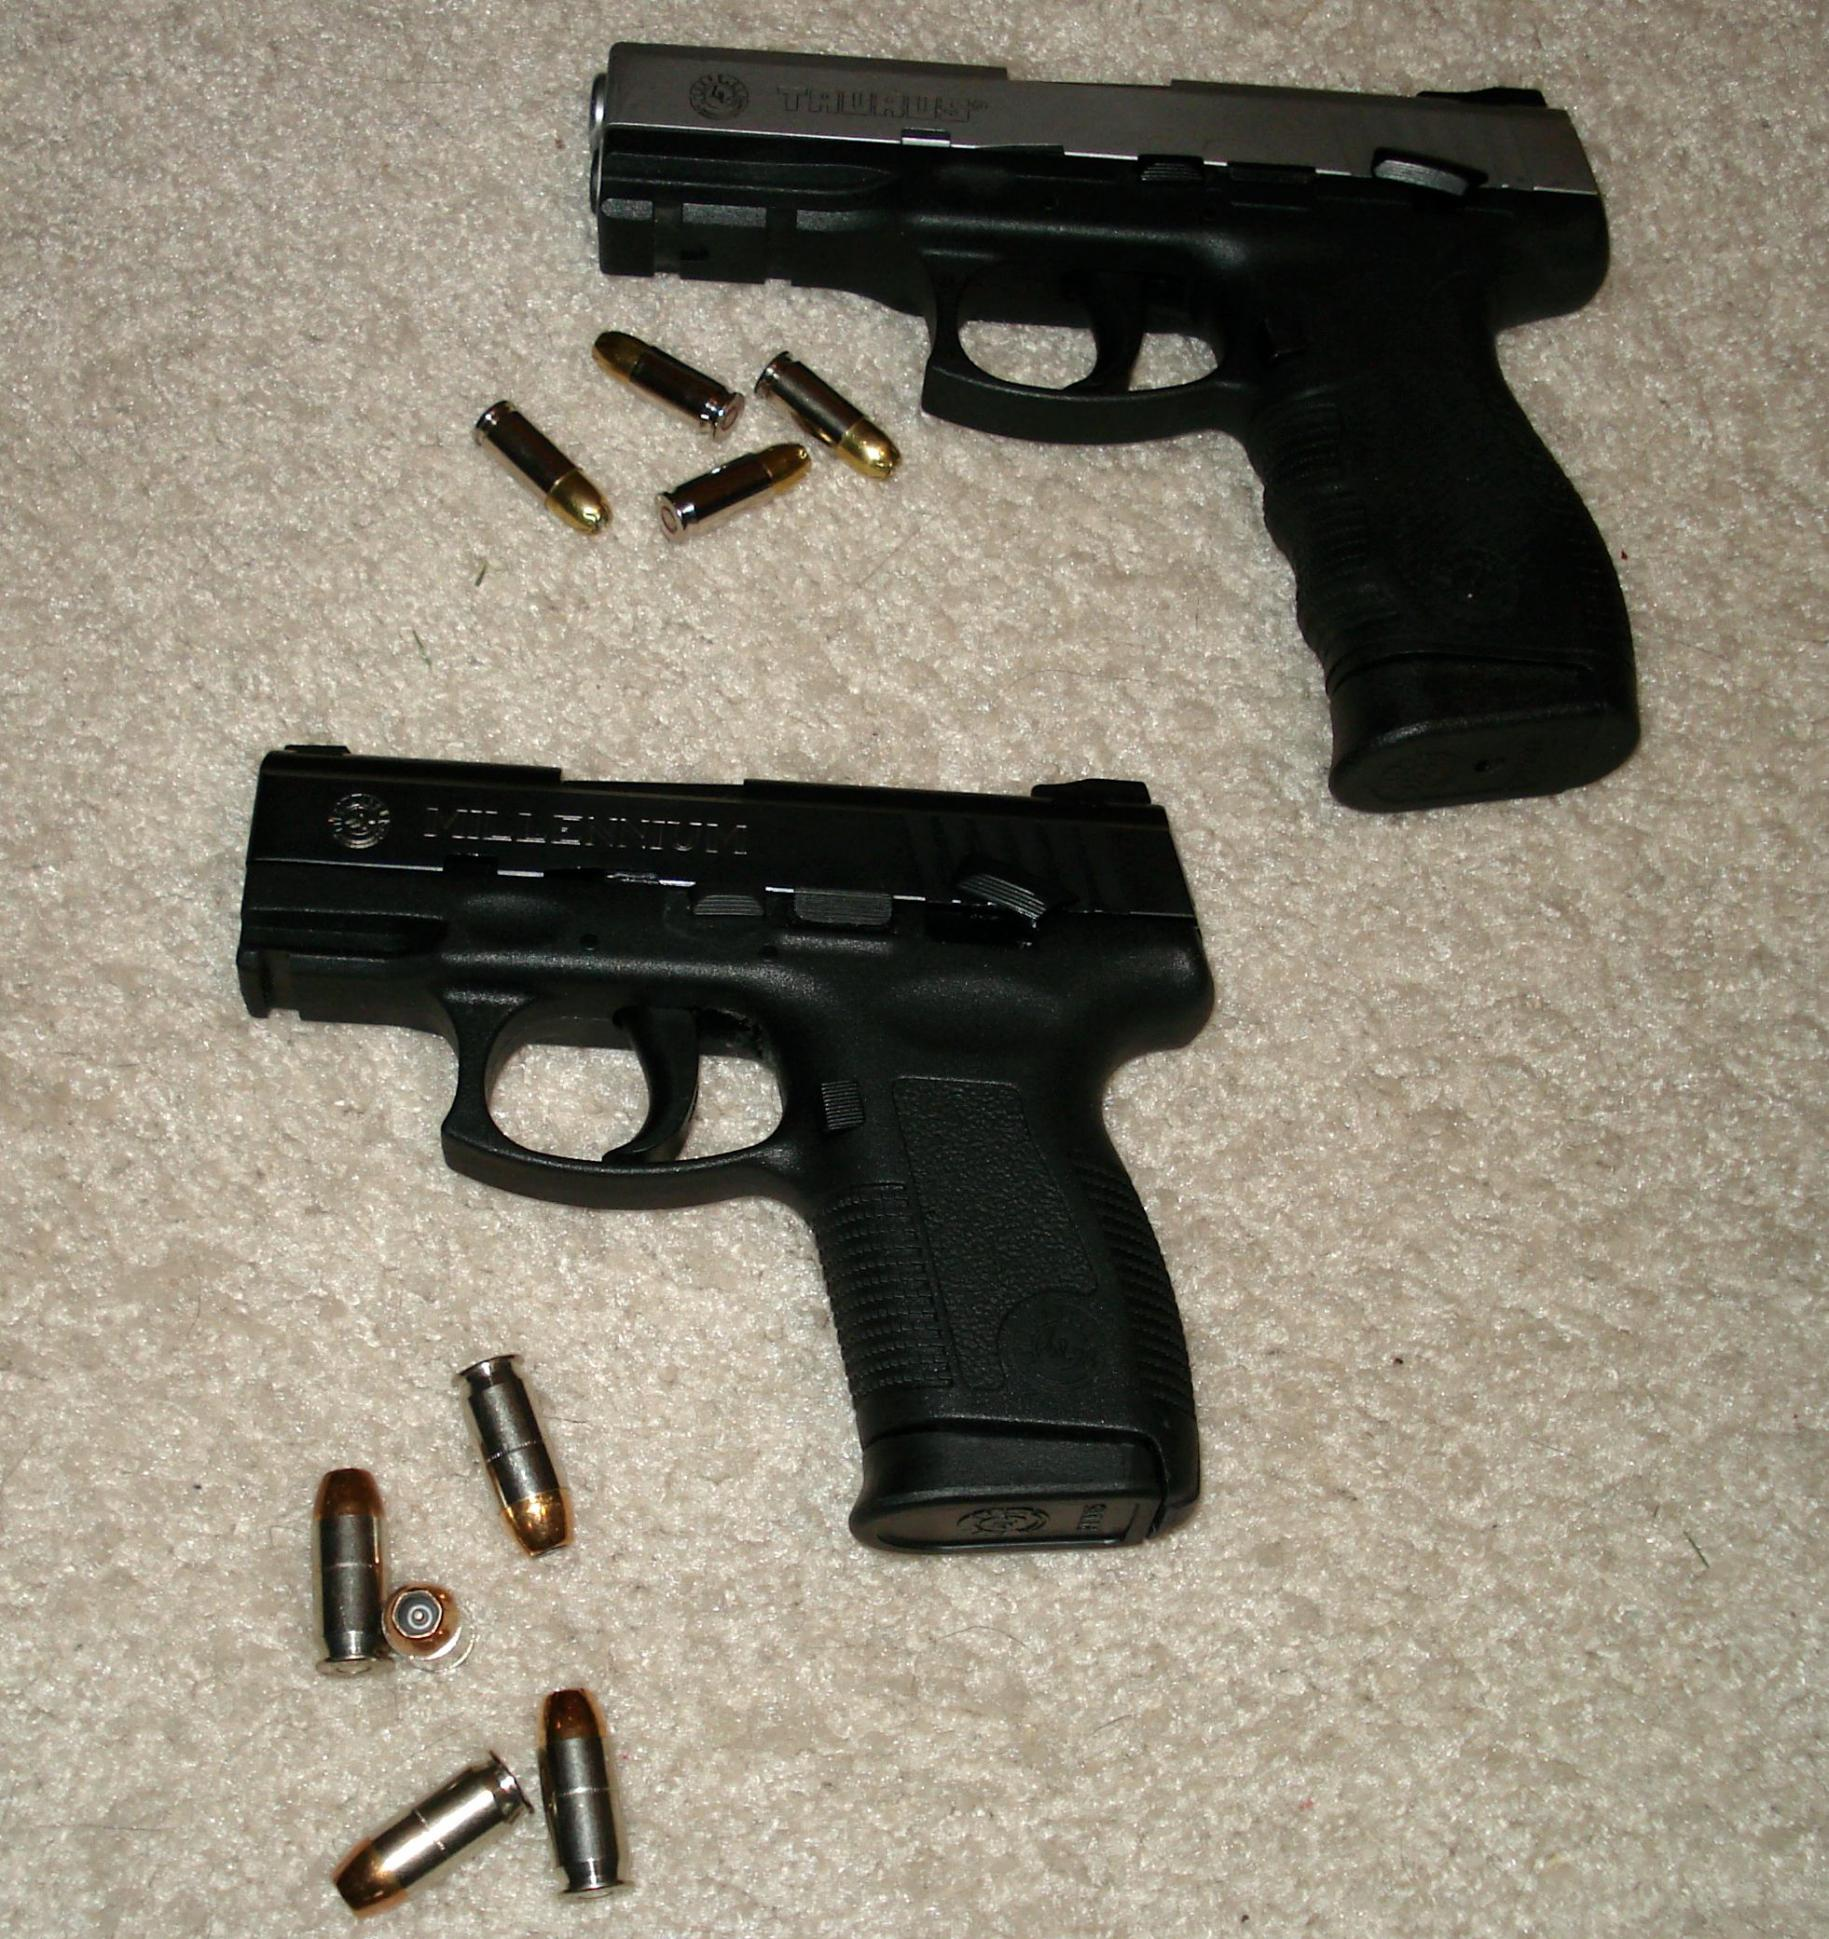 New Gun-pic-1.jpg